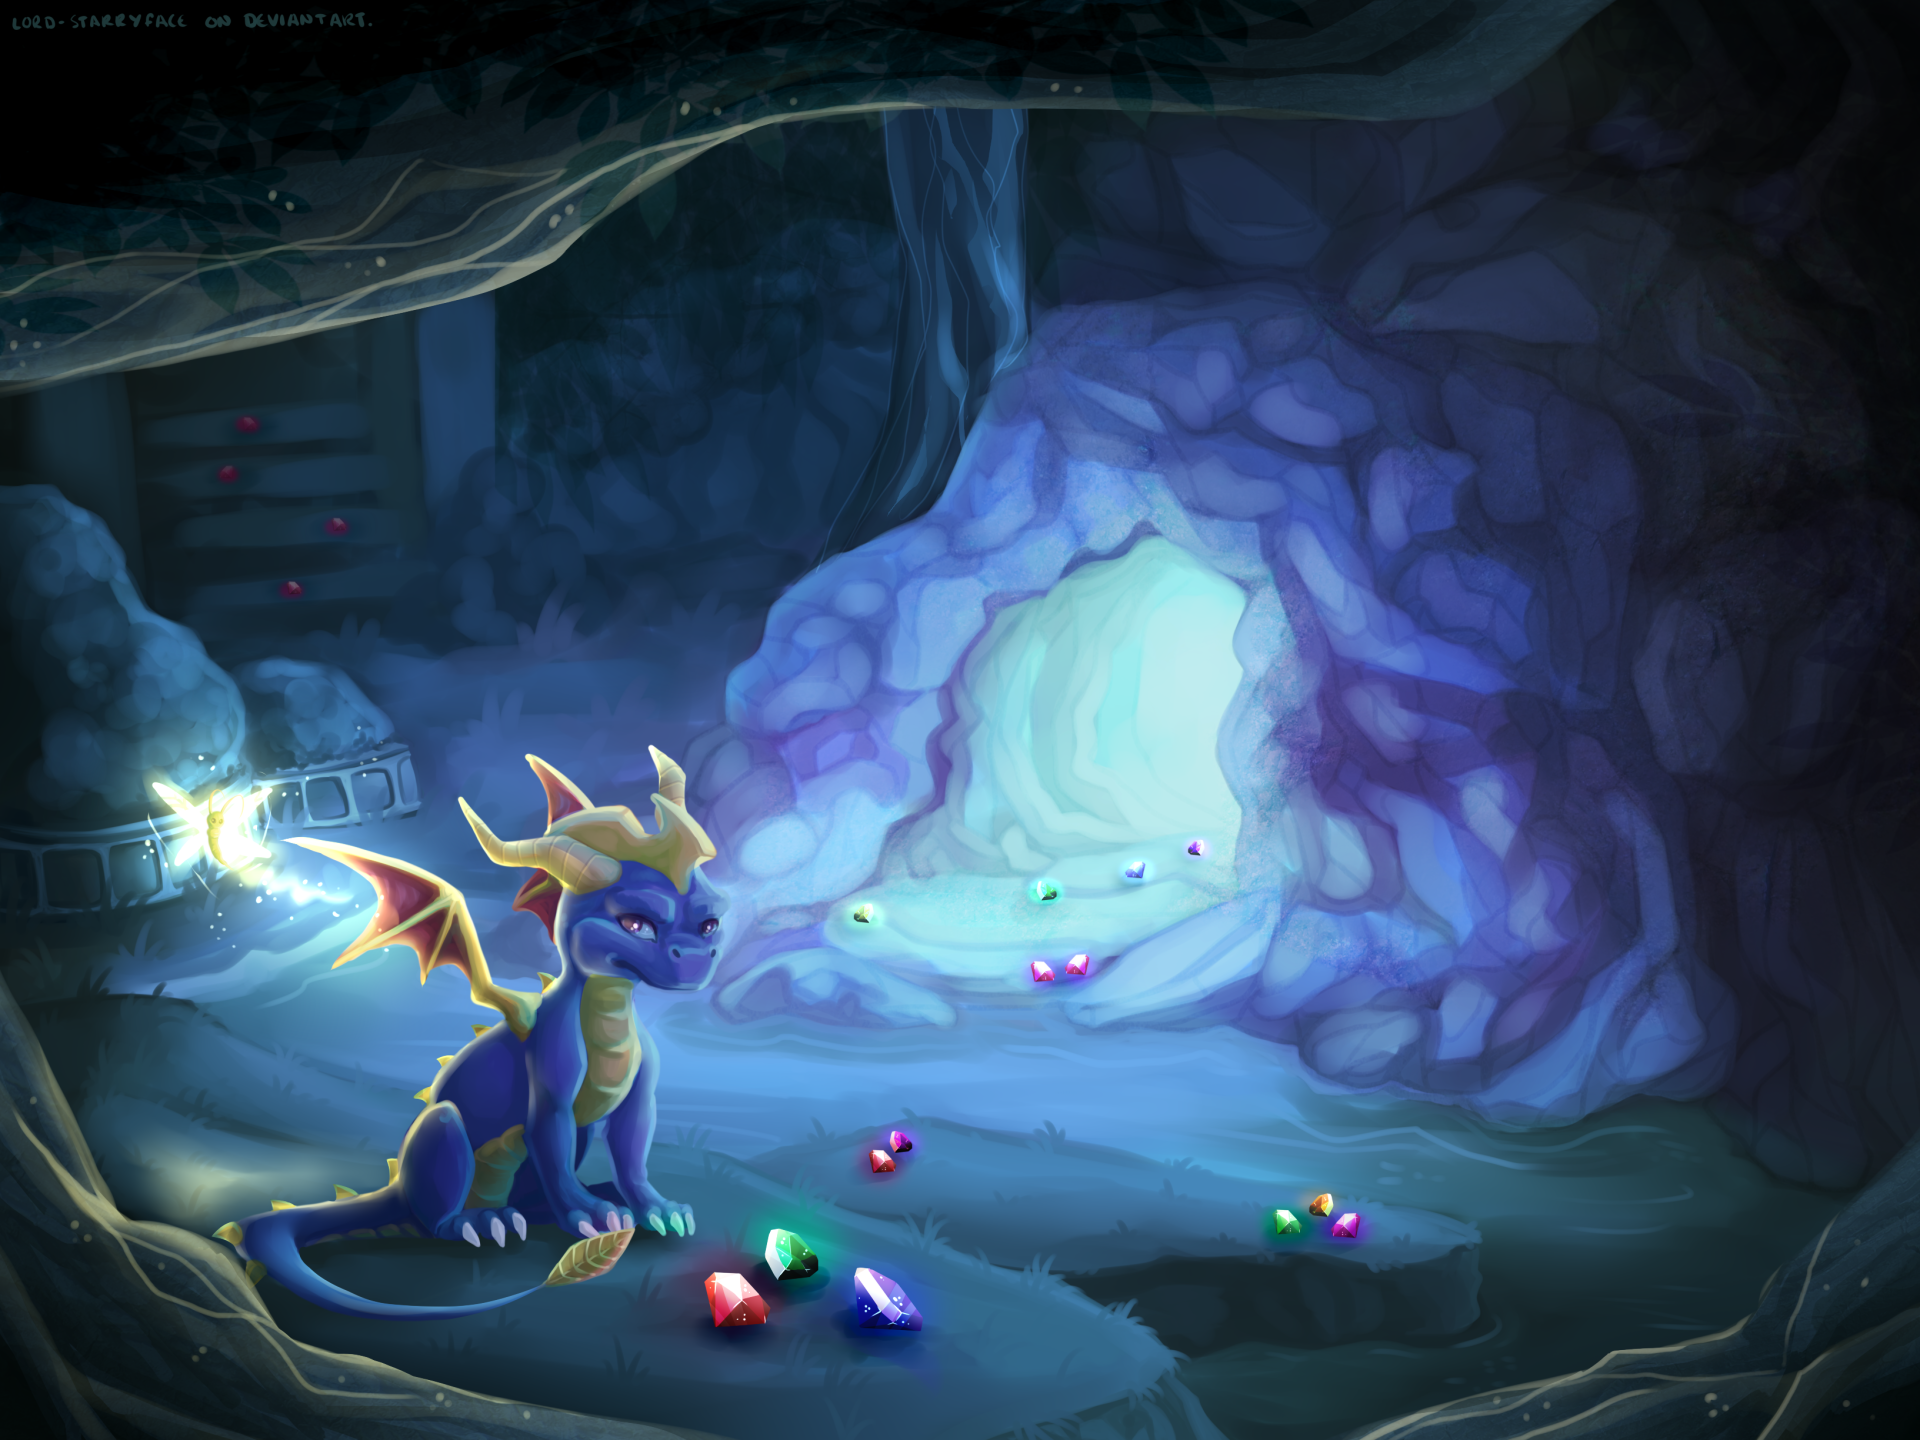 Spyro and sparx hd wallpaper background image - Spyro wallpaper ...